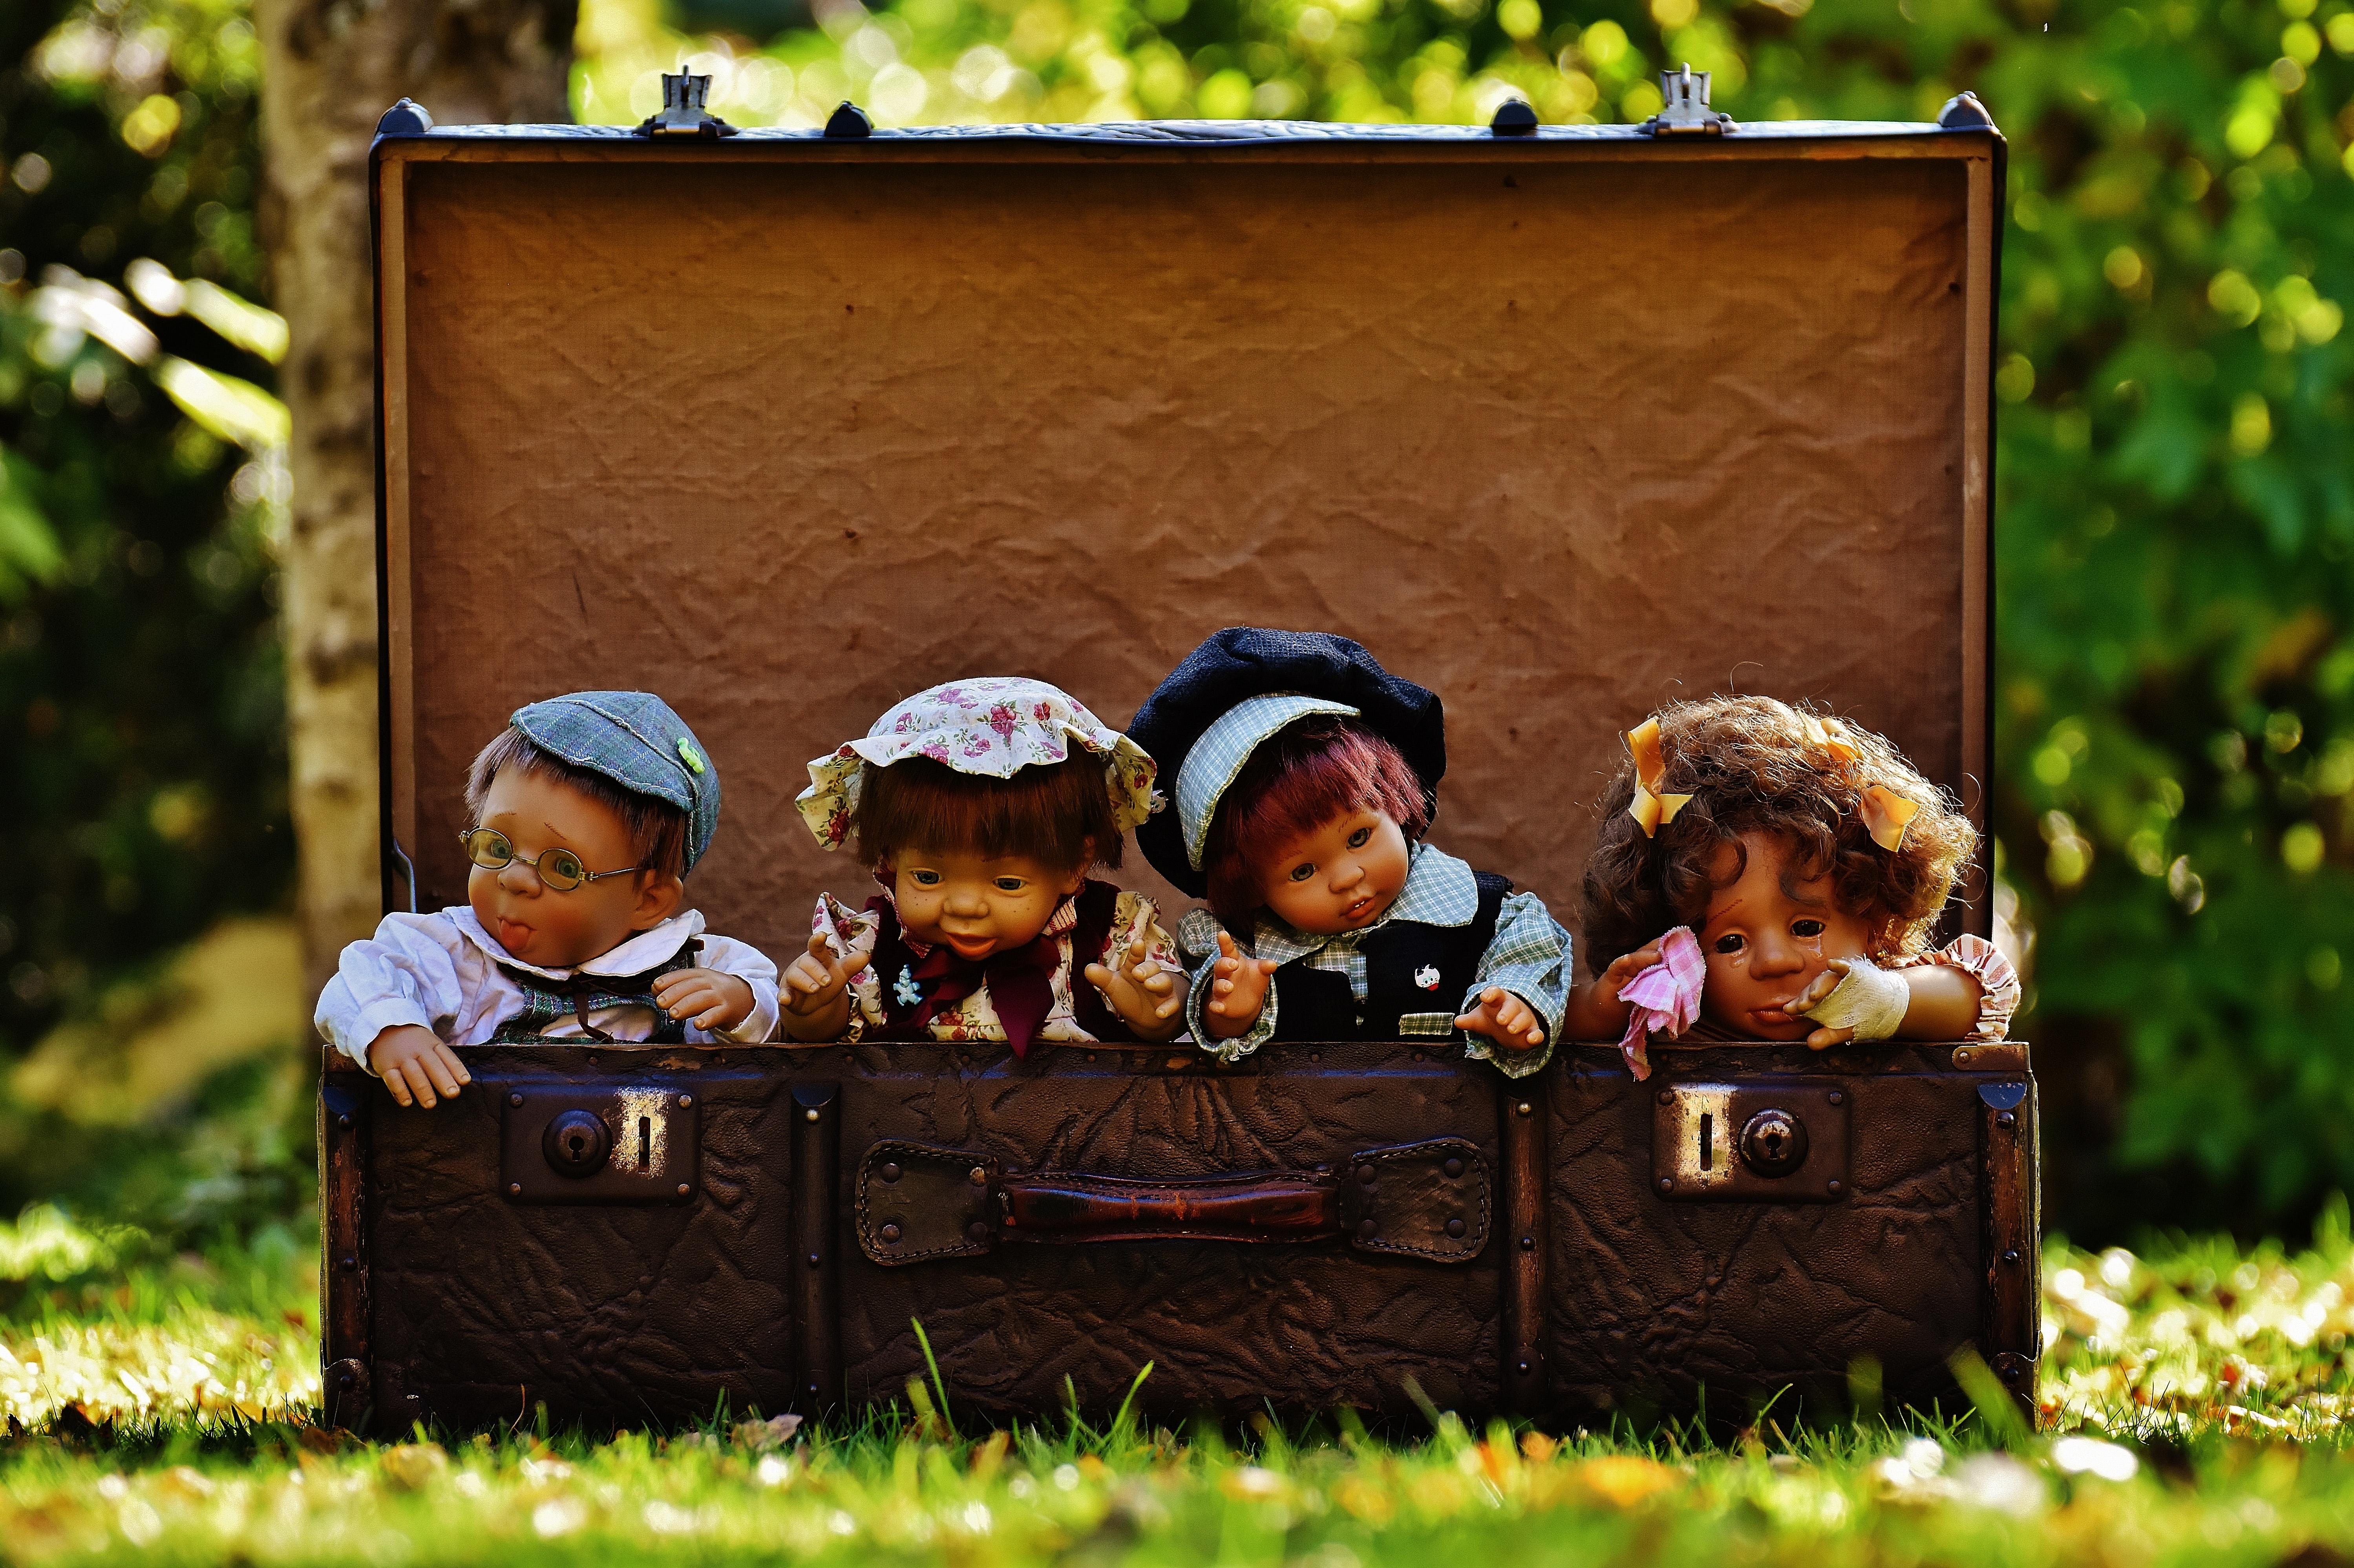 4 Porcelain Dolls in Brown Rectangular Box, Adorable, Joy, Travel, Toddler, HQ Photo